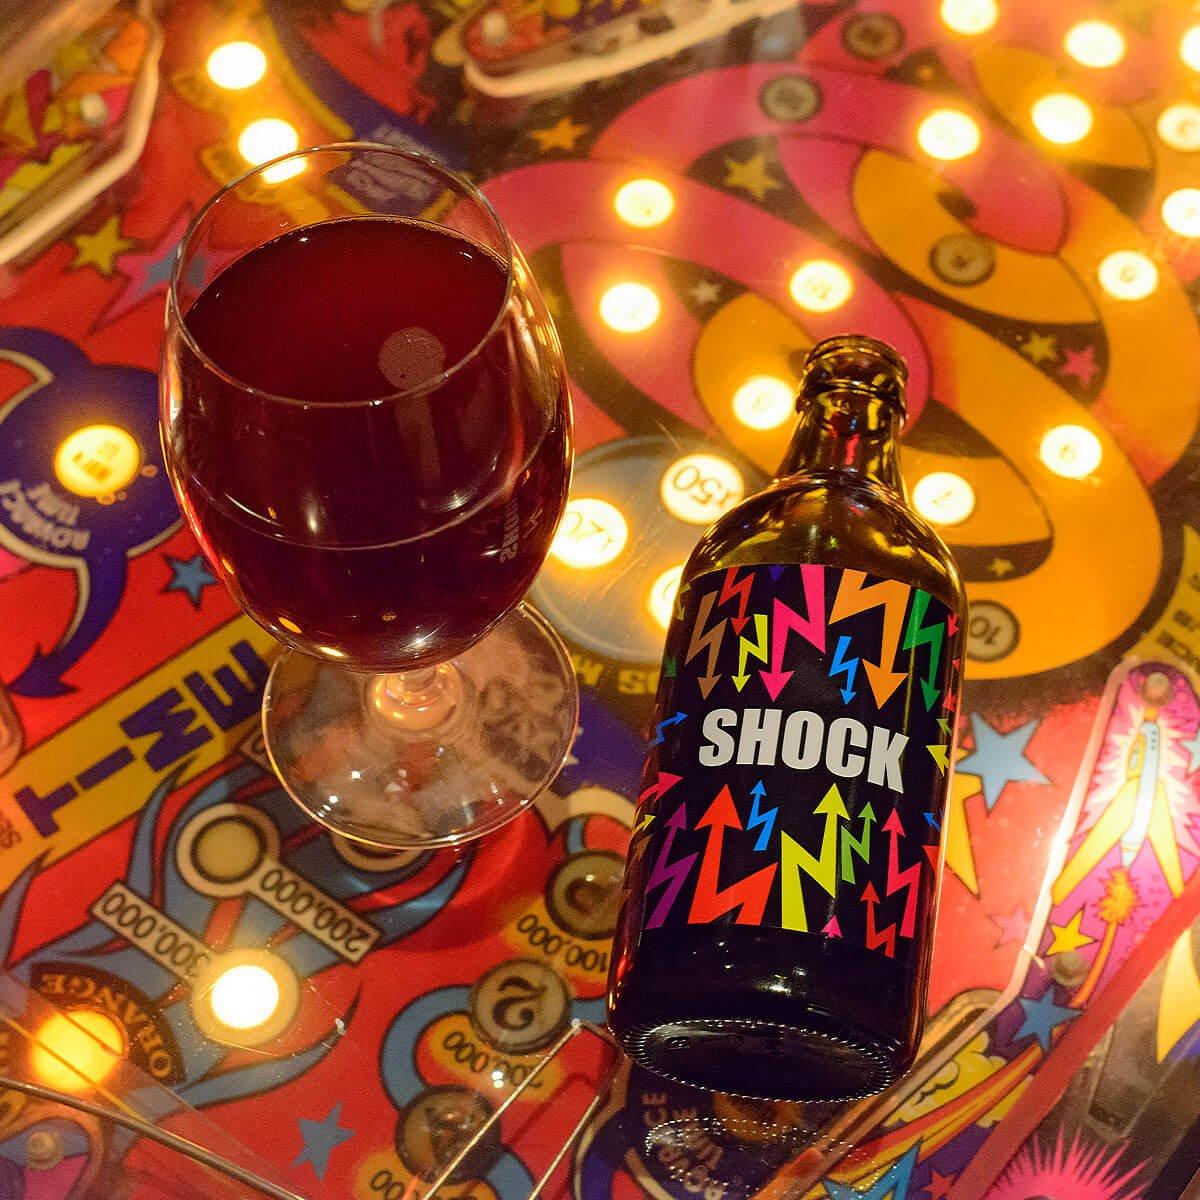 Shock, a Belgian-style Strong Dark Ale brewed by Birradamare SRL